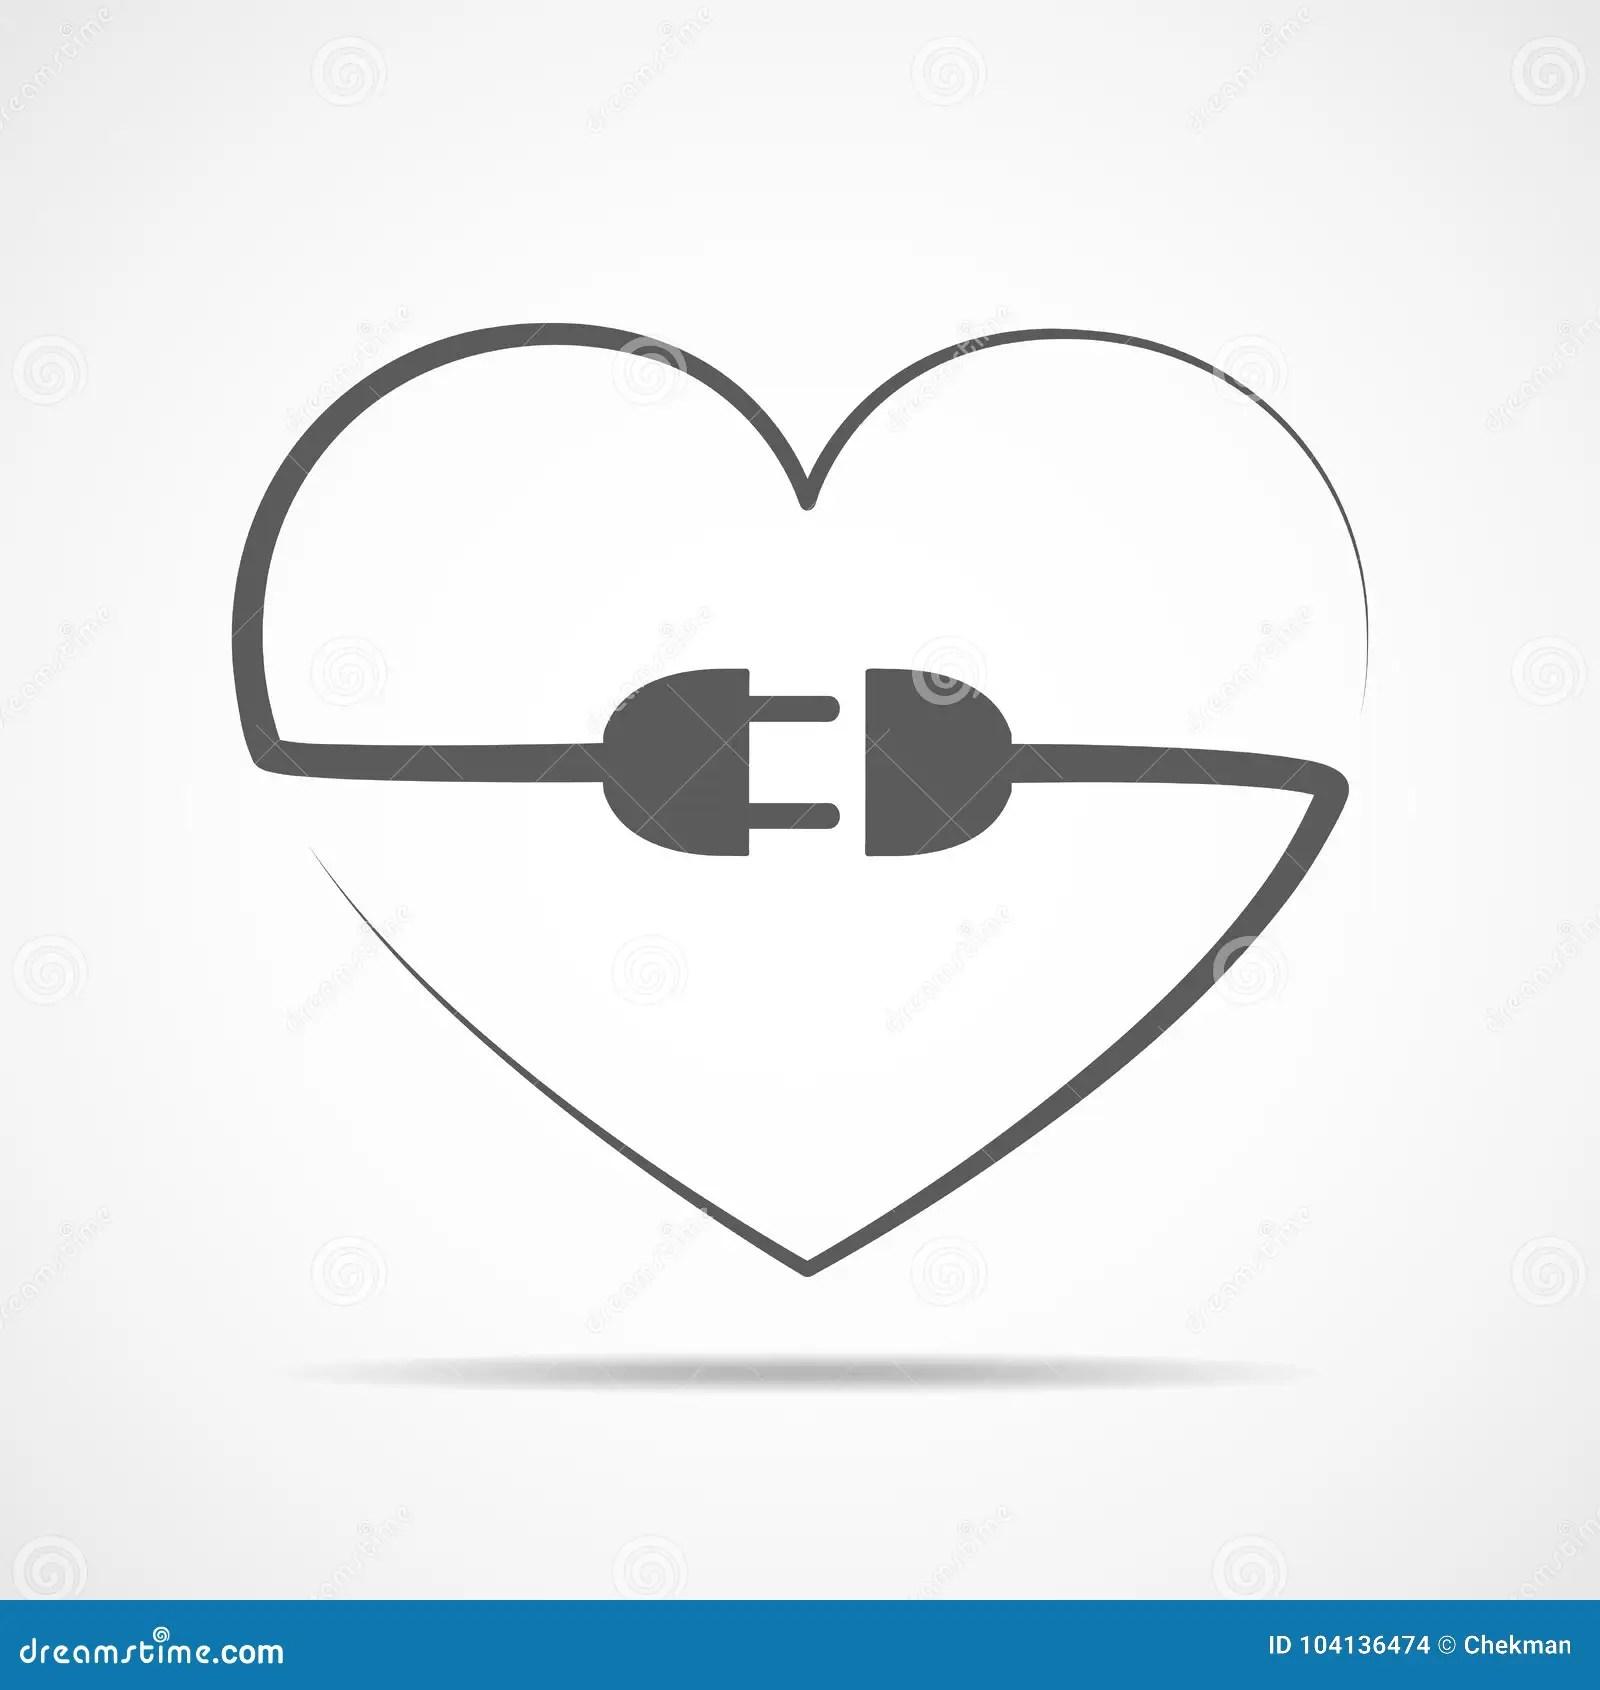 Abstract Heart Vector Illustration Stock Illustration